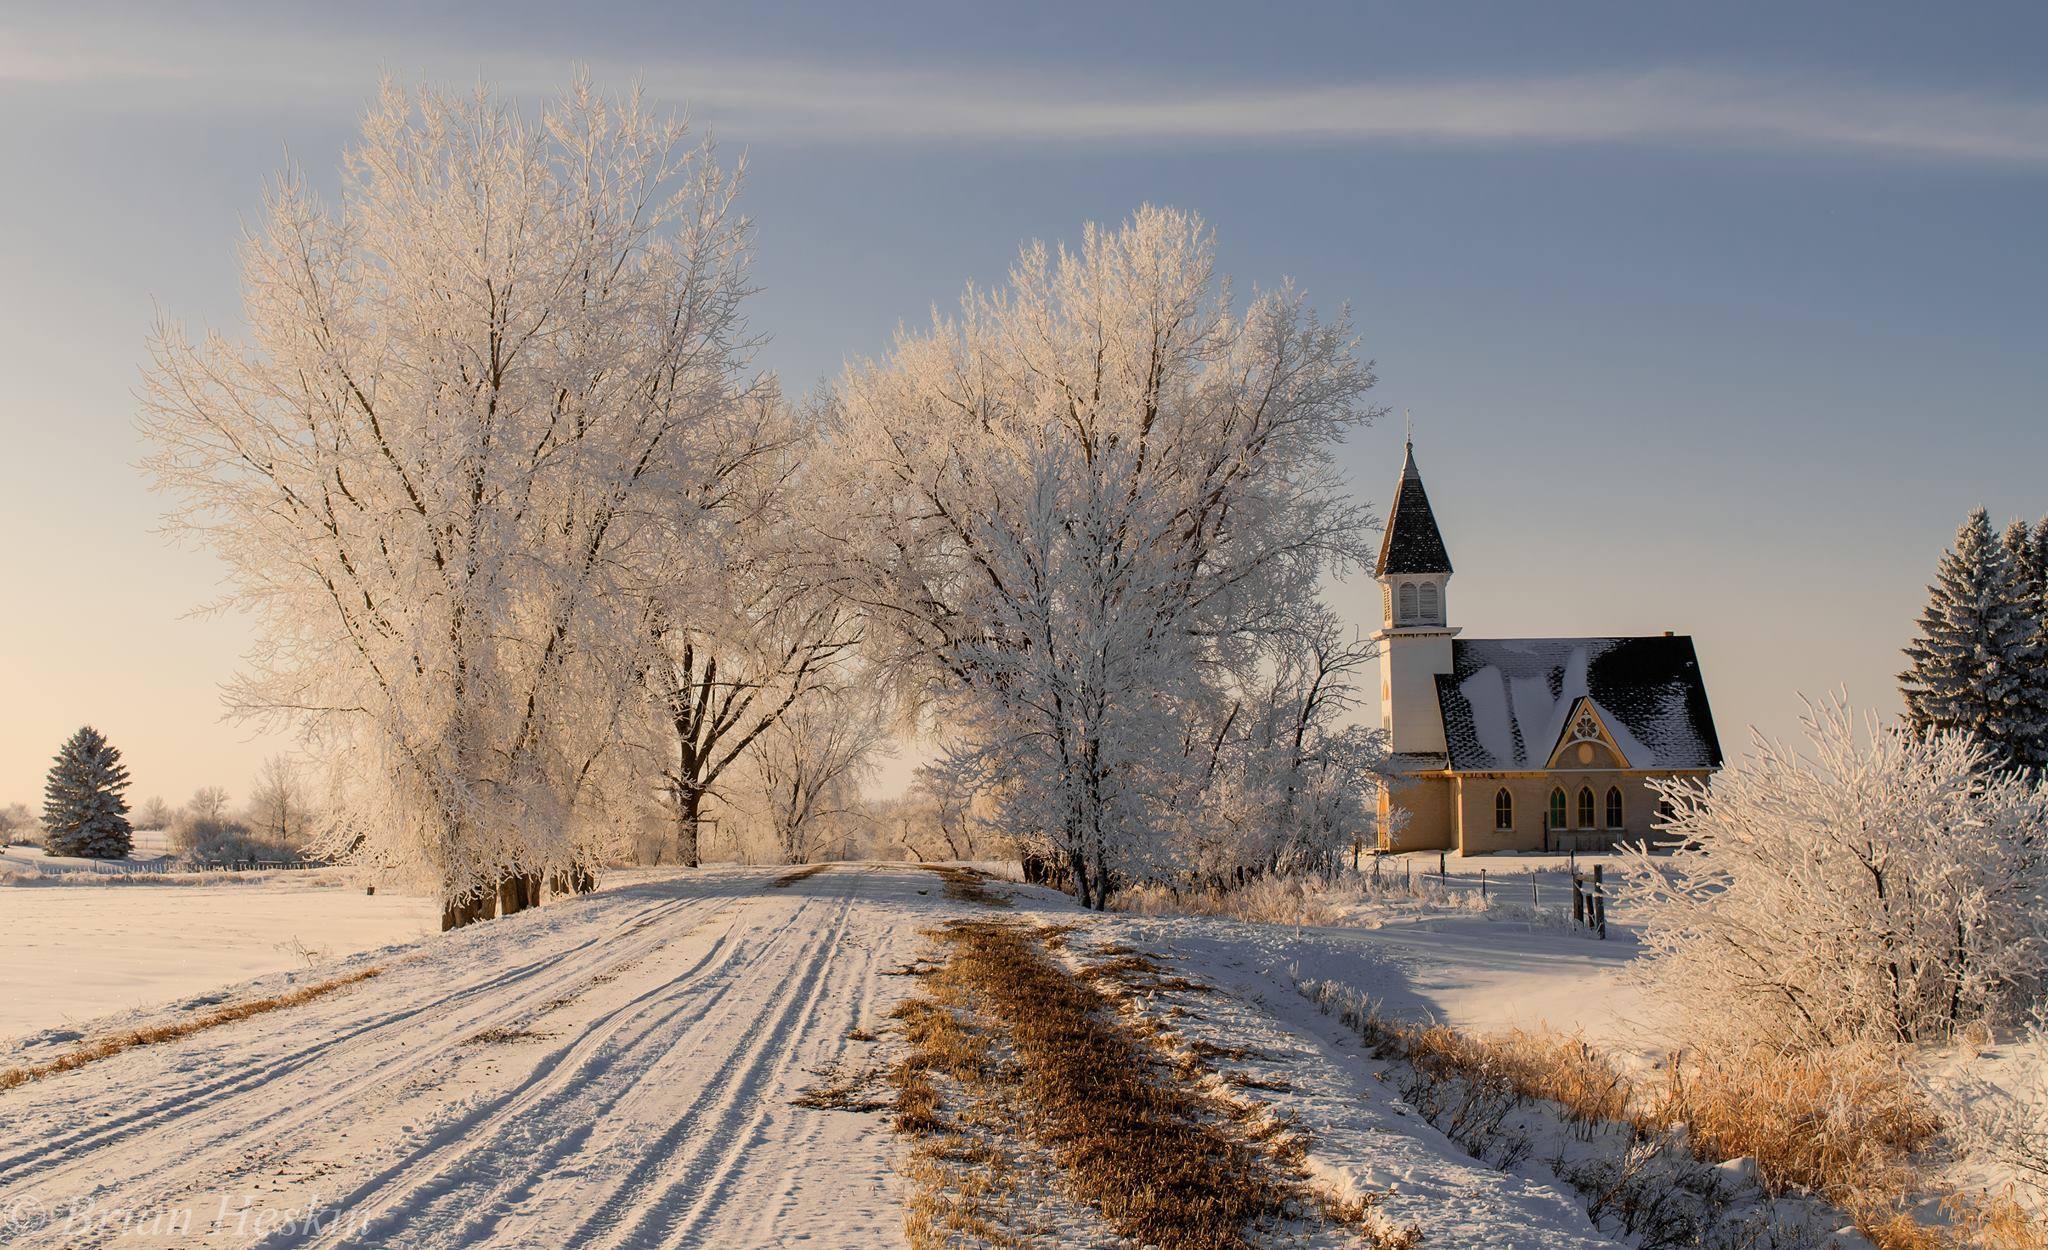 Norway Lutheran church south of Denbigh, North Dakota.jpg